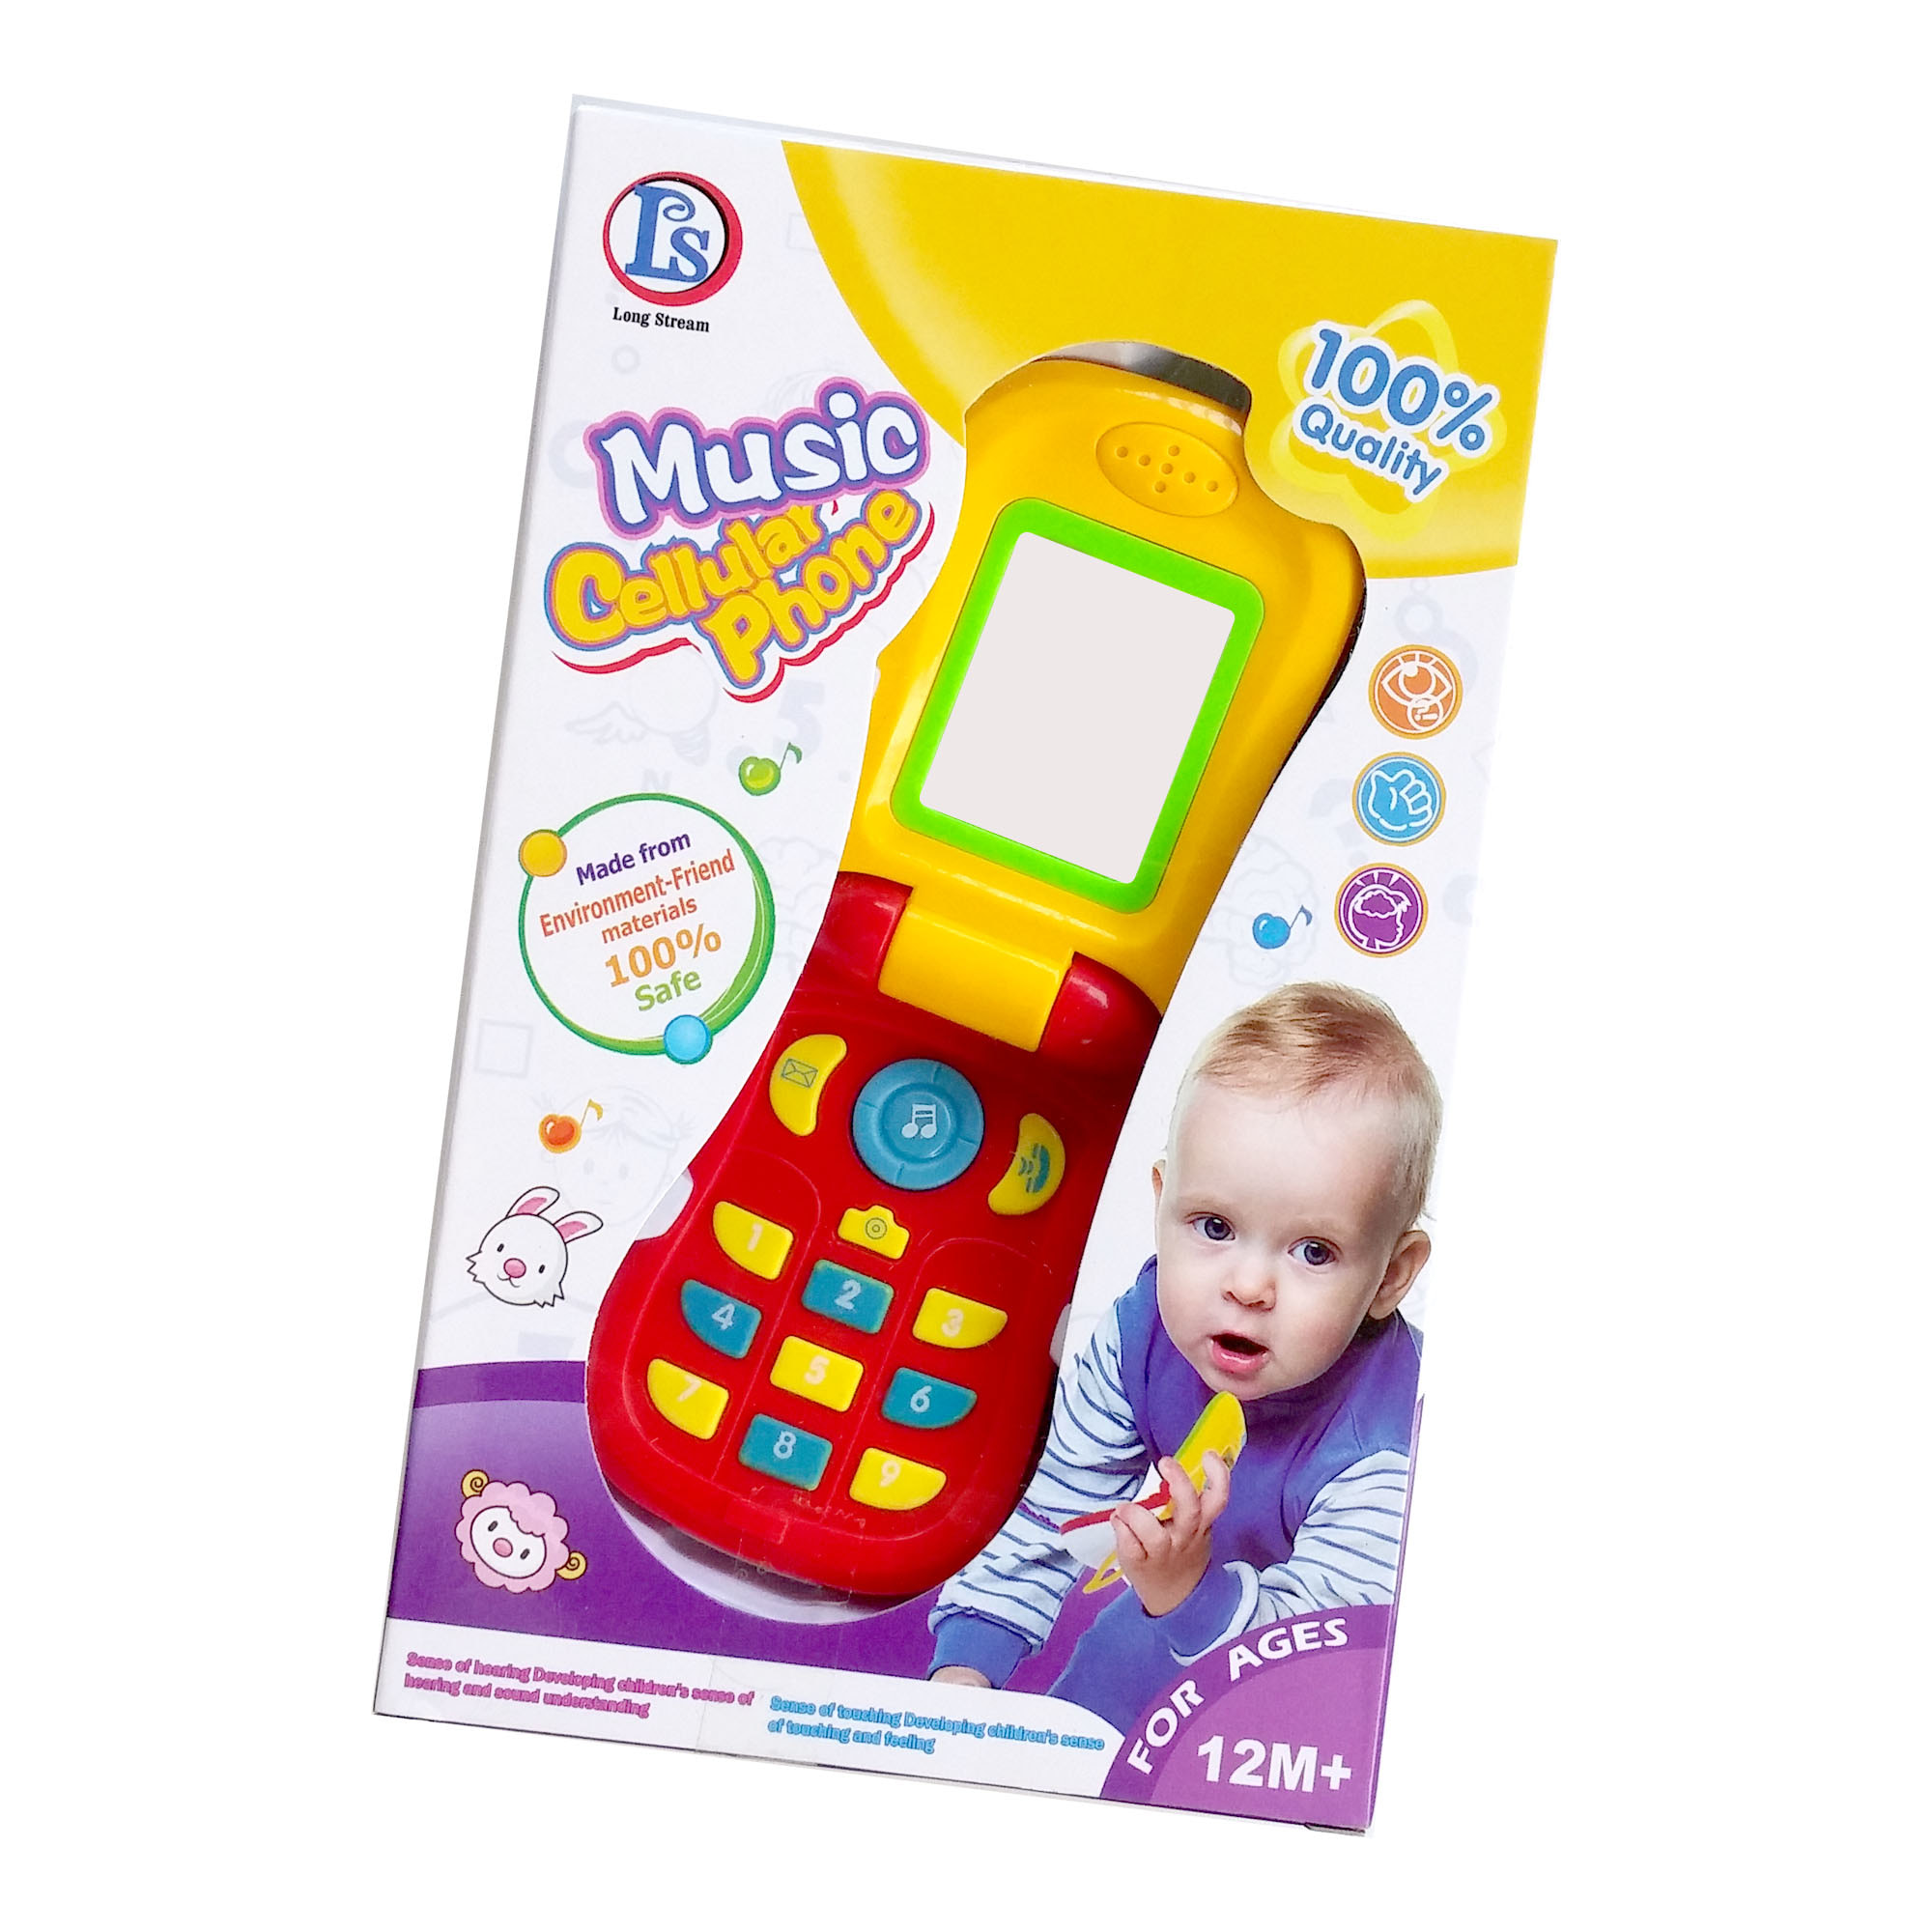 Jual Music Cellular Phone Mainan Anak Baby Telepon Handphone HP Happy Store